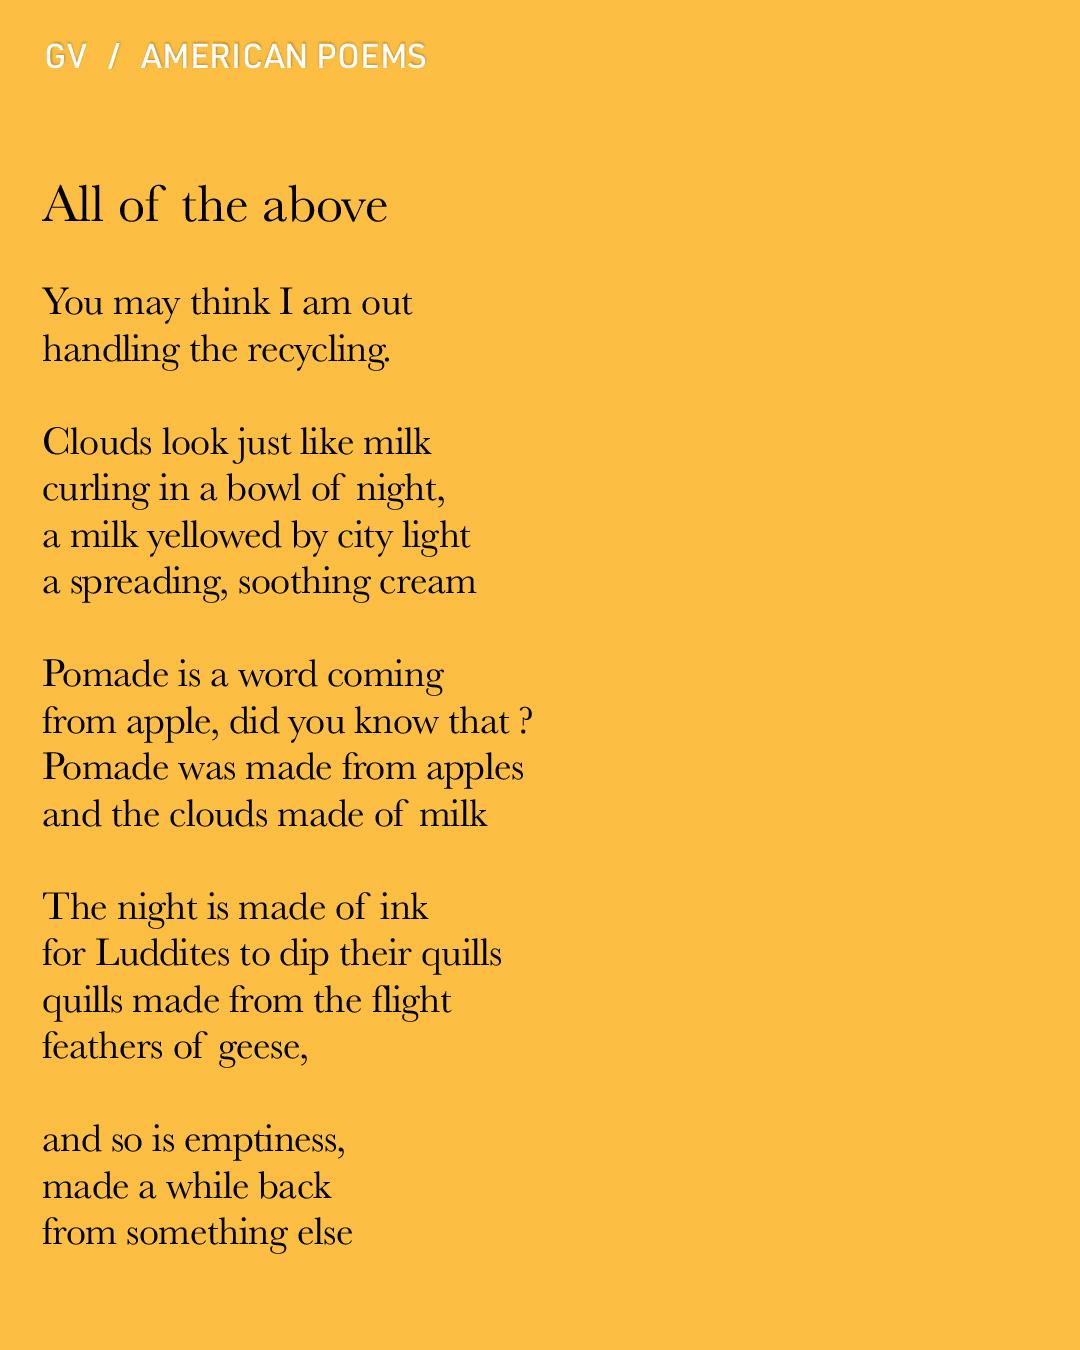 Gvion-PoemsA-AllofTheAbove.jpg